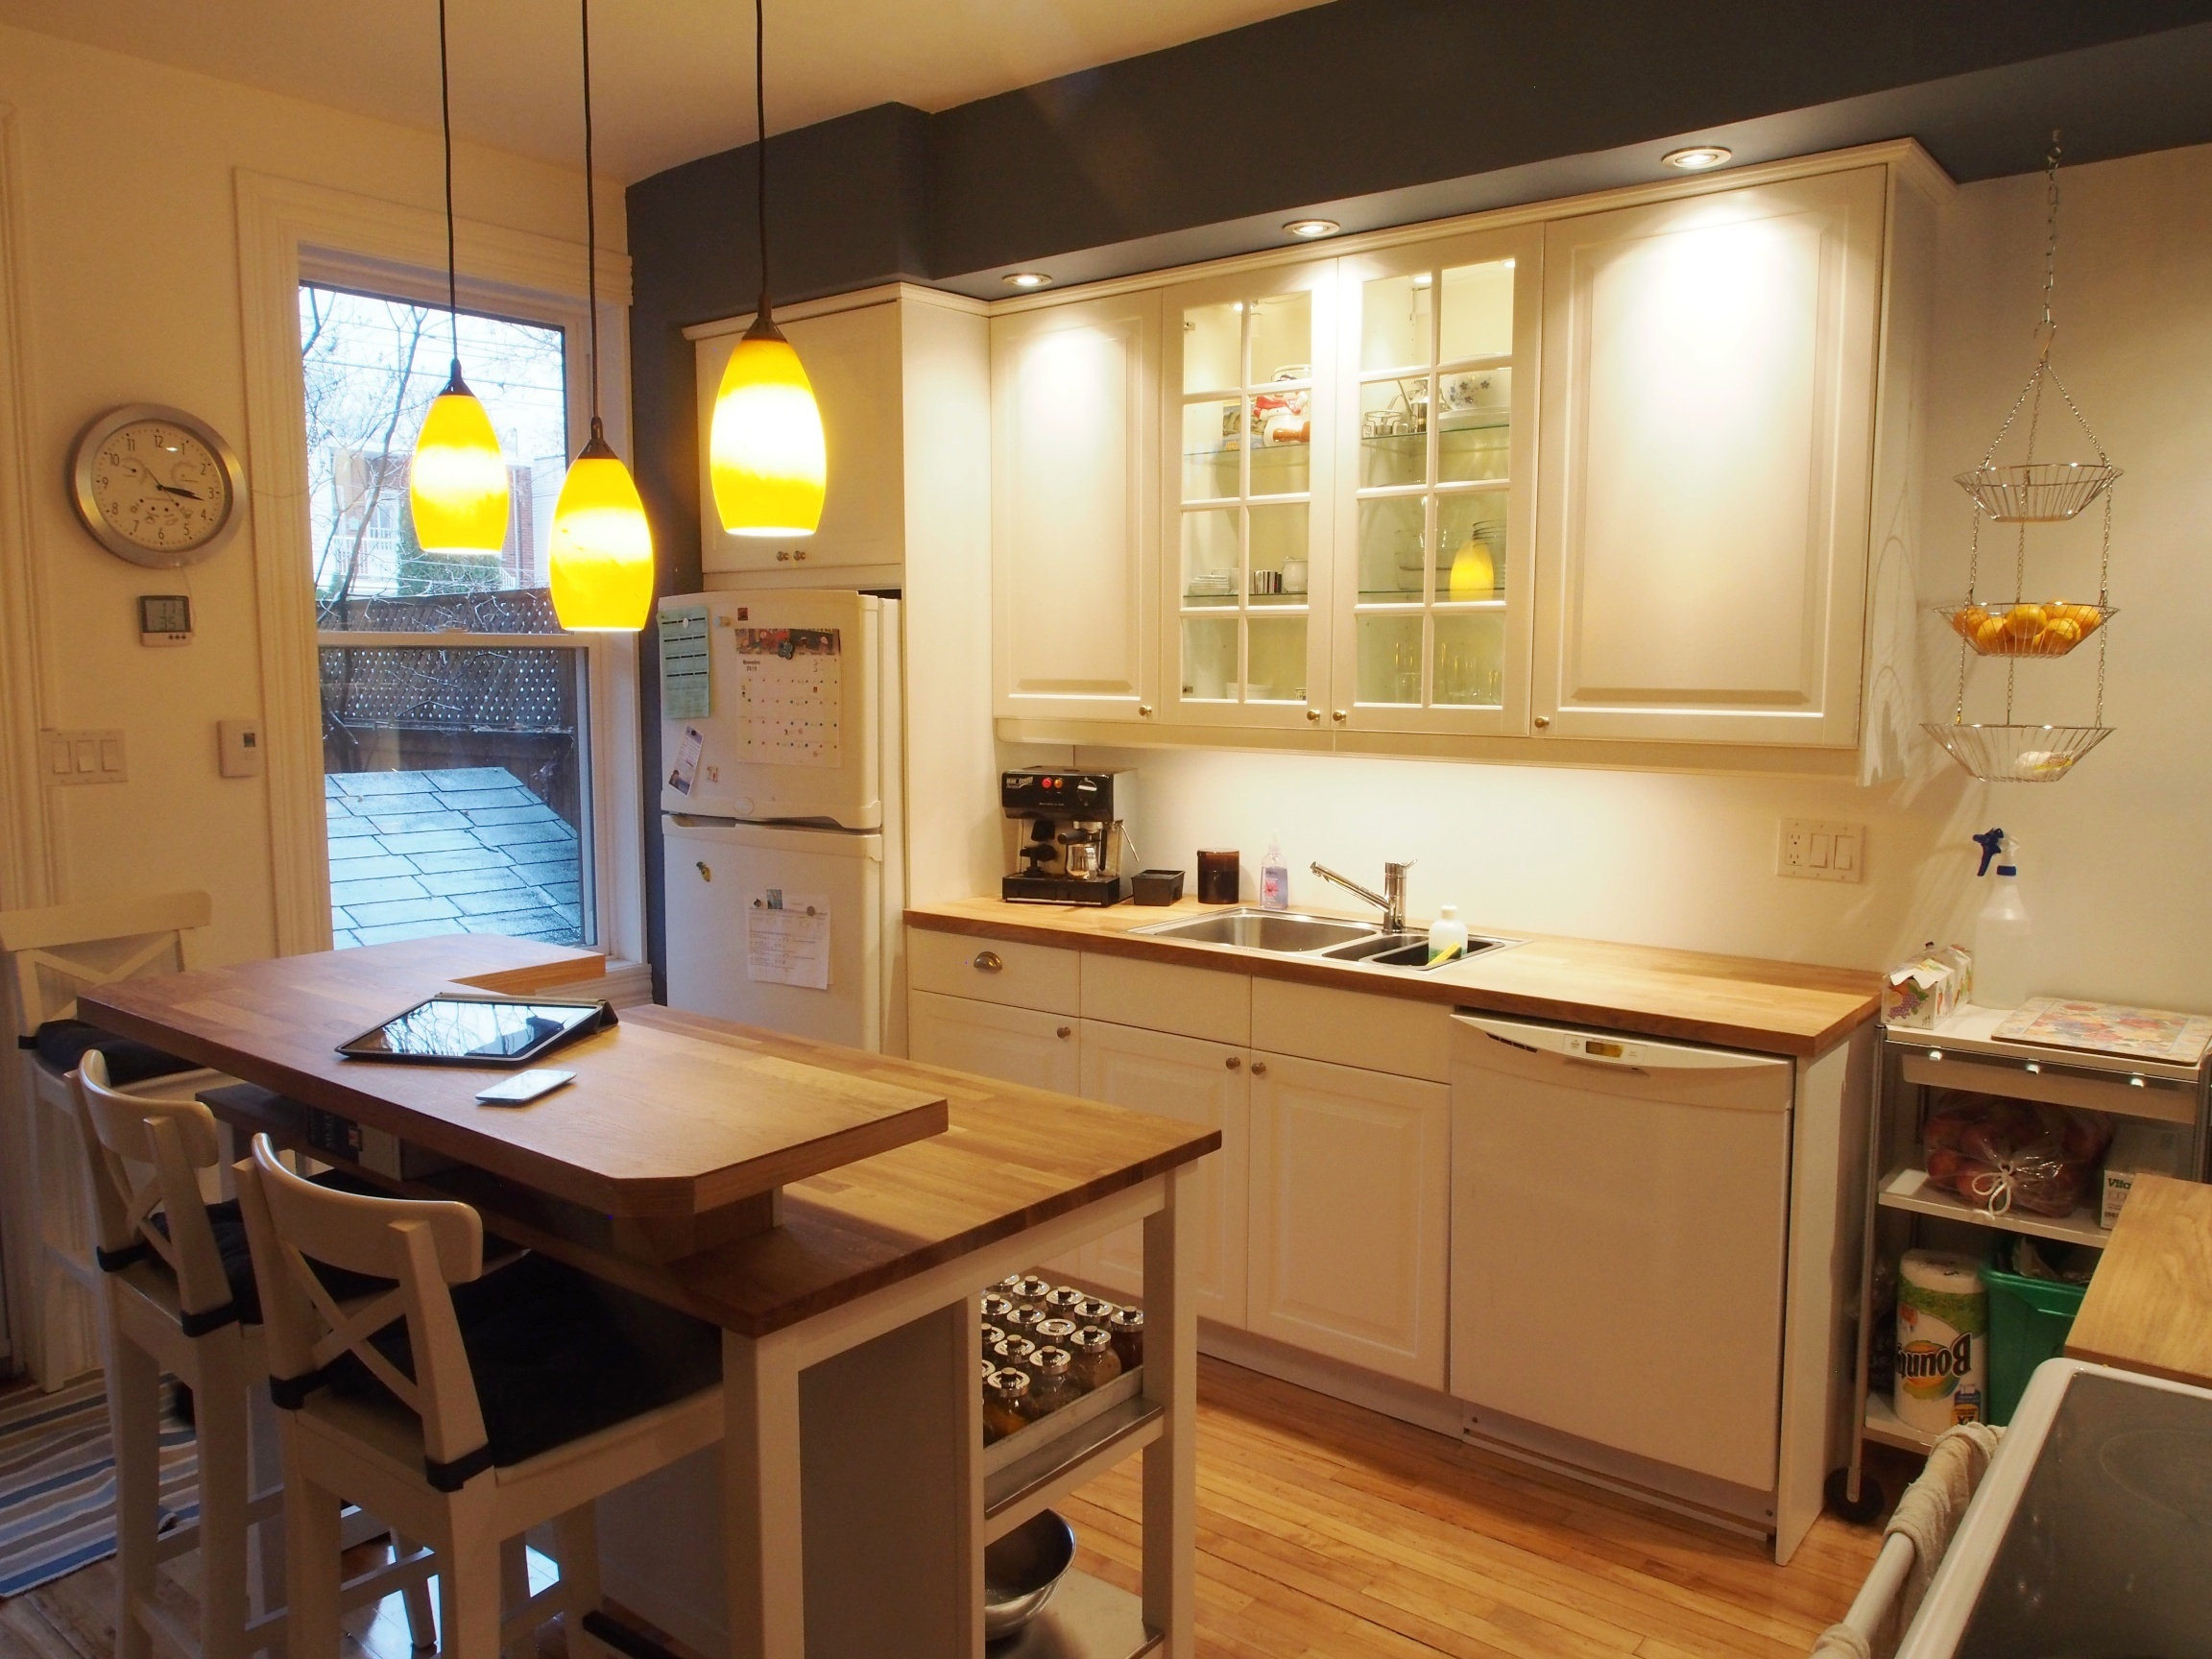 ikd kitchen favorite the cozy family ikea kitchen. Black Bedroom Furniture Sets. Home Design Ideas